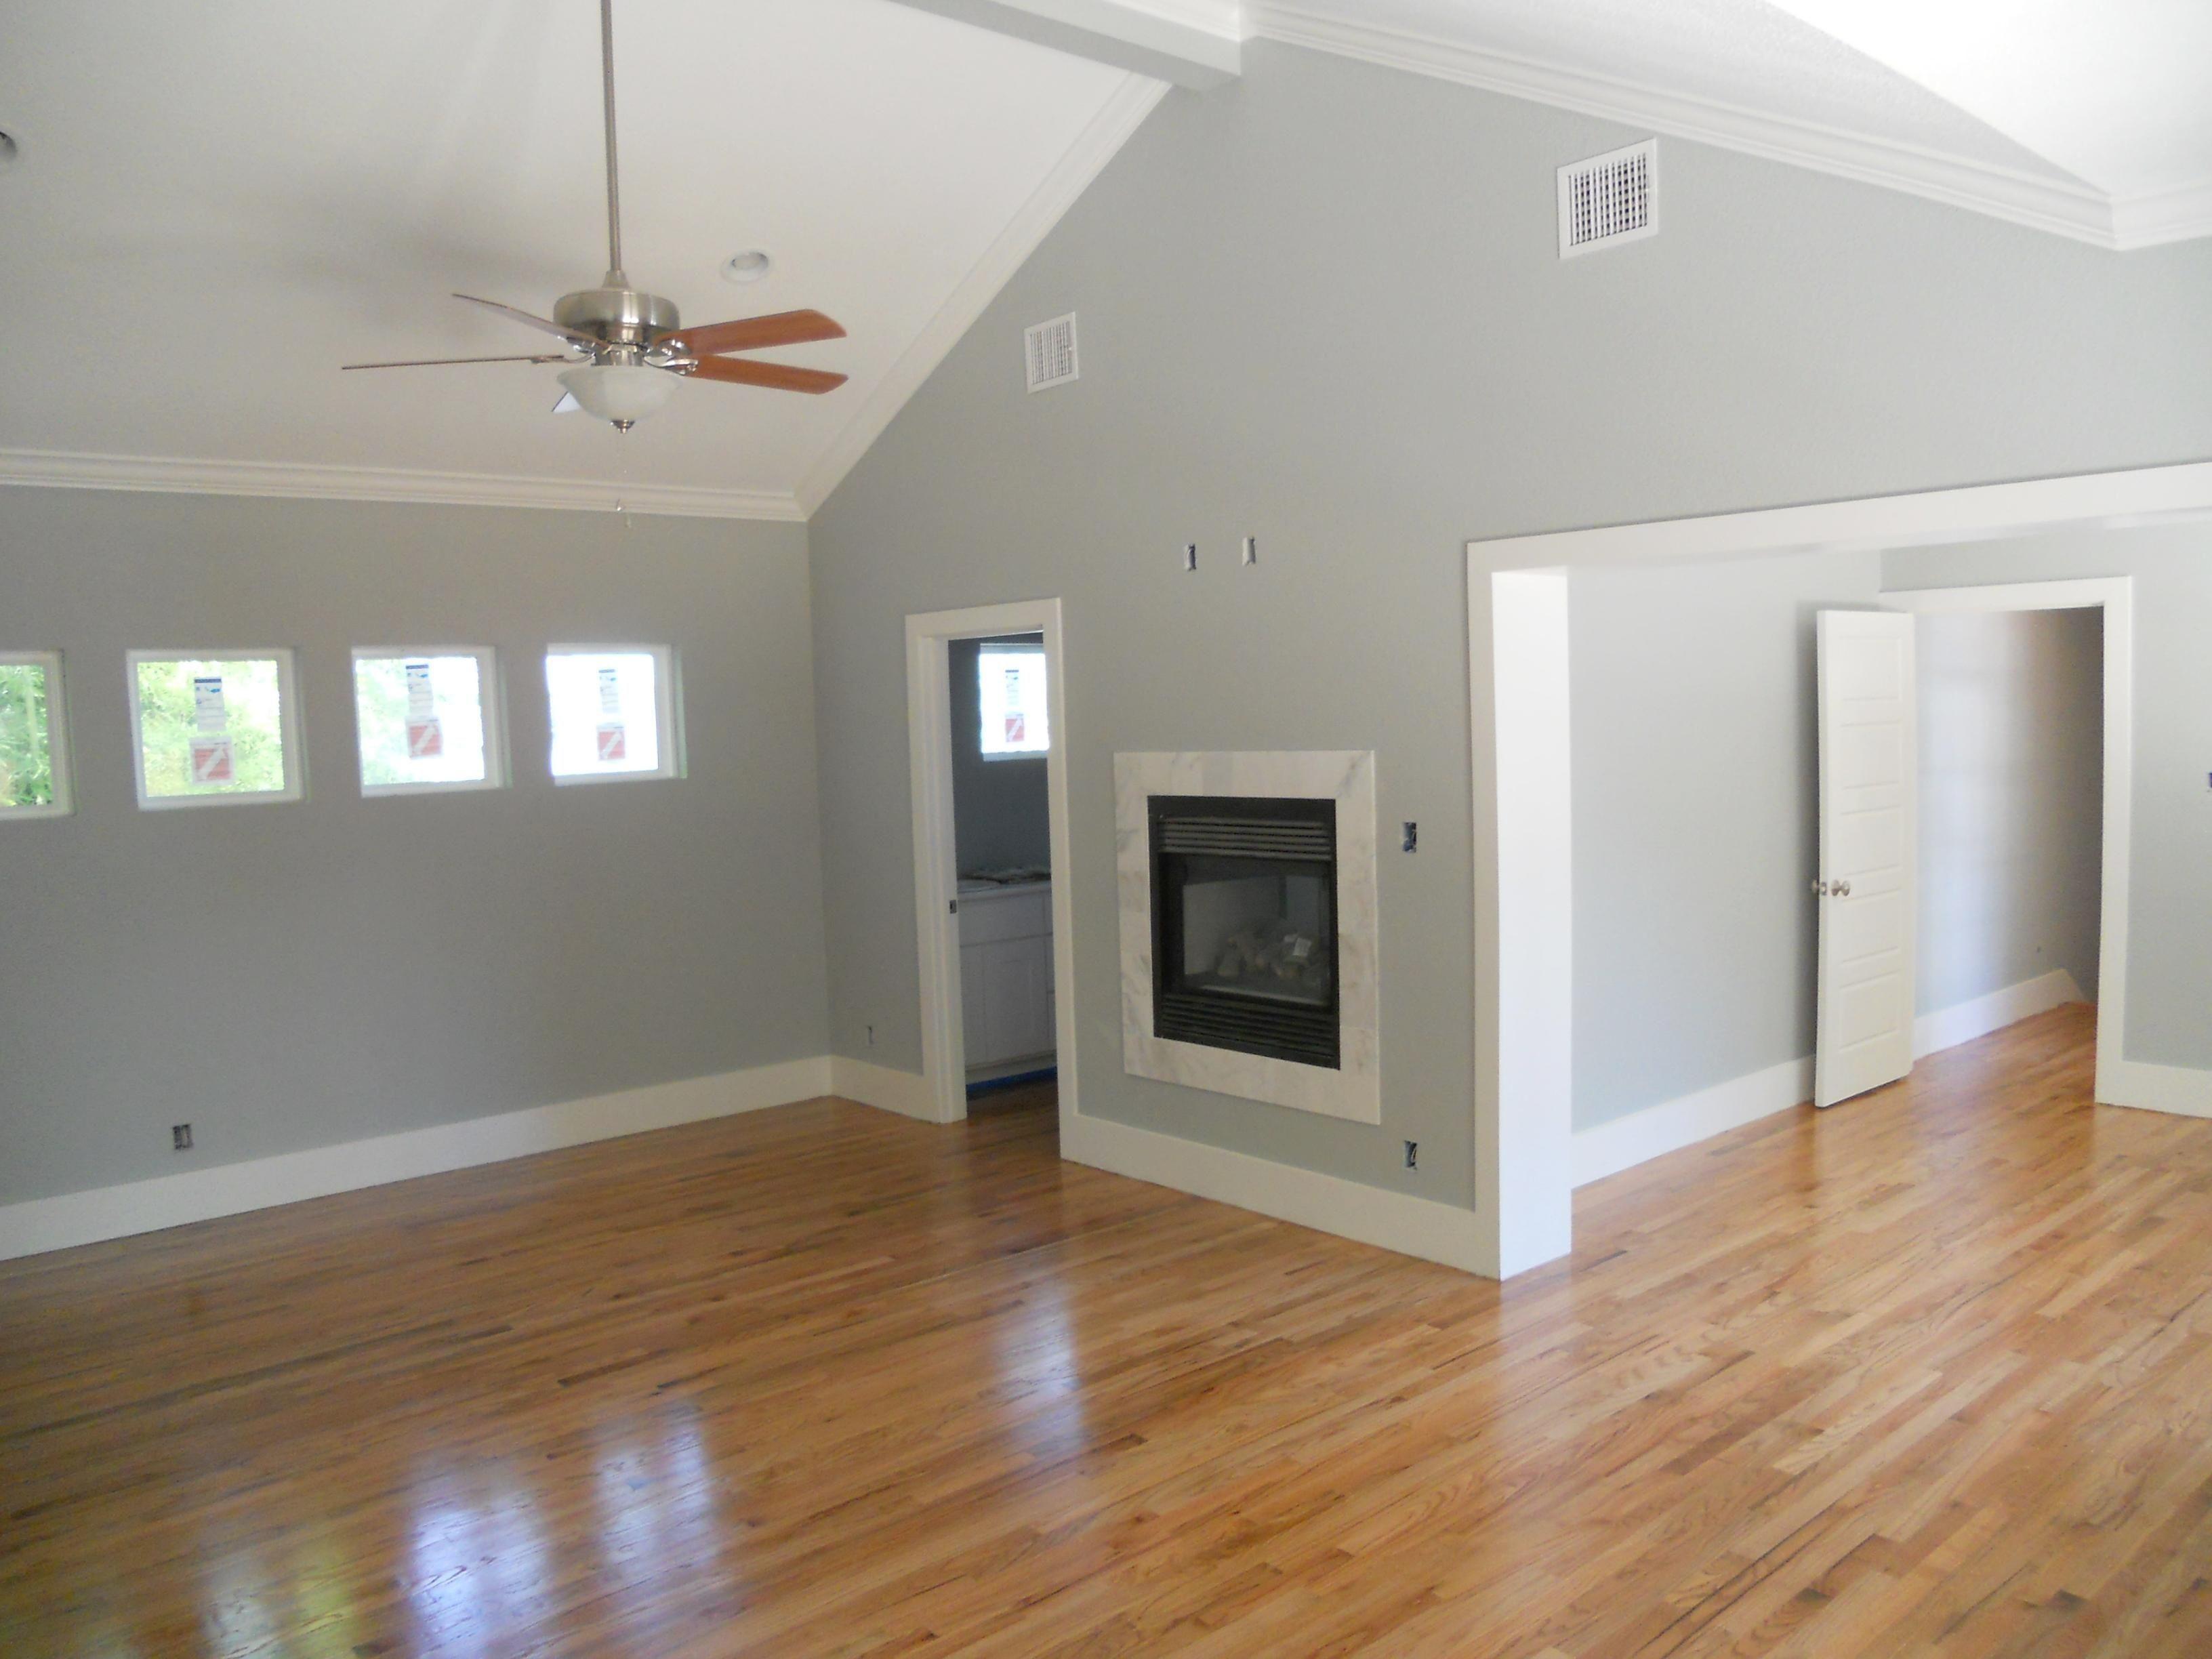 Dark Brown Wooden Color Laminate Flooring With Grey Walls In